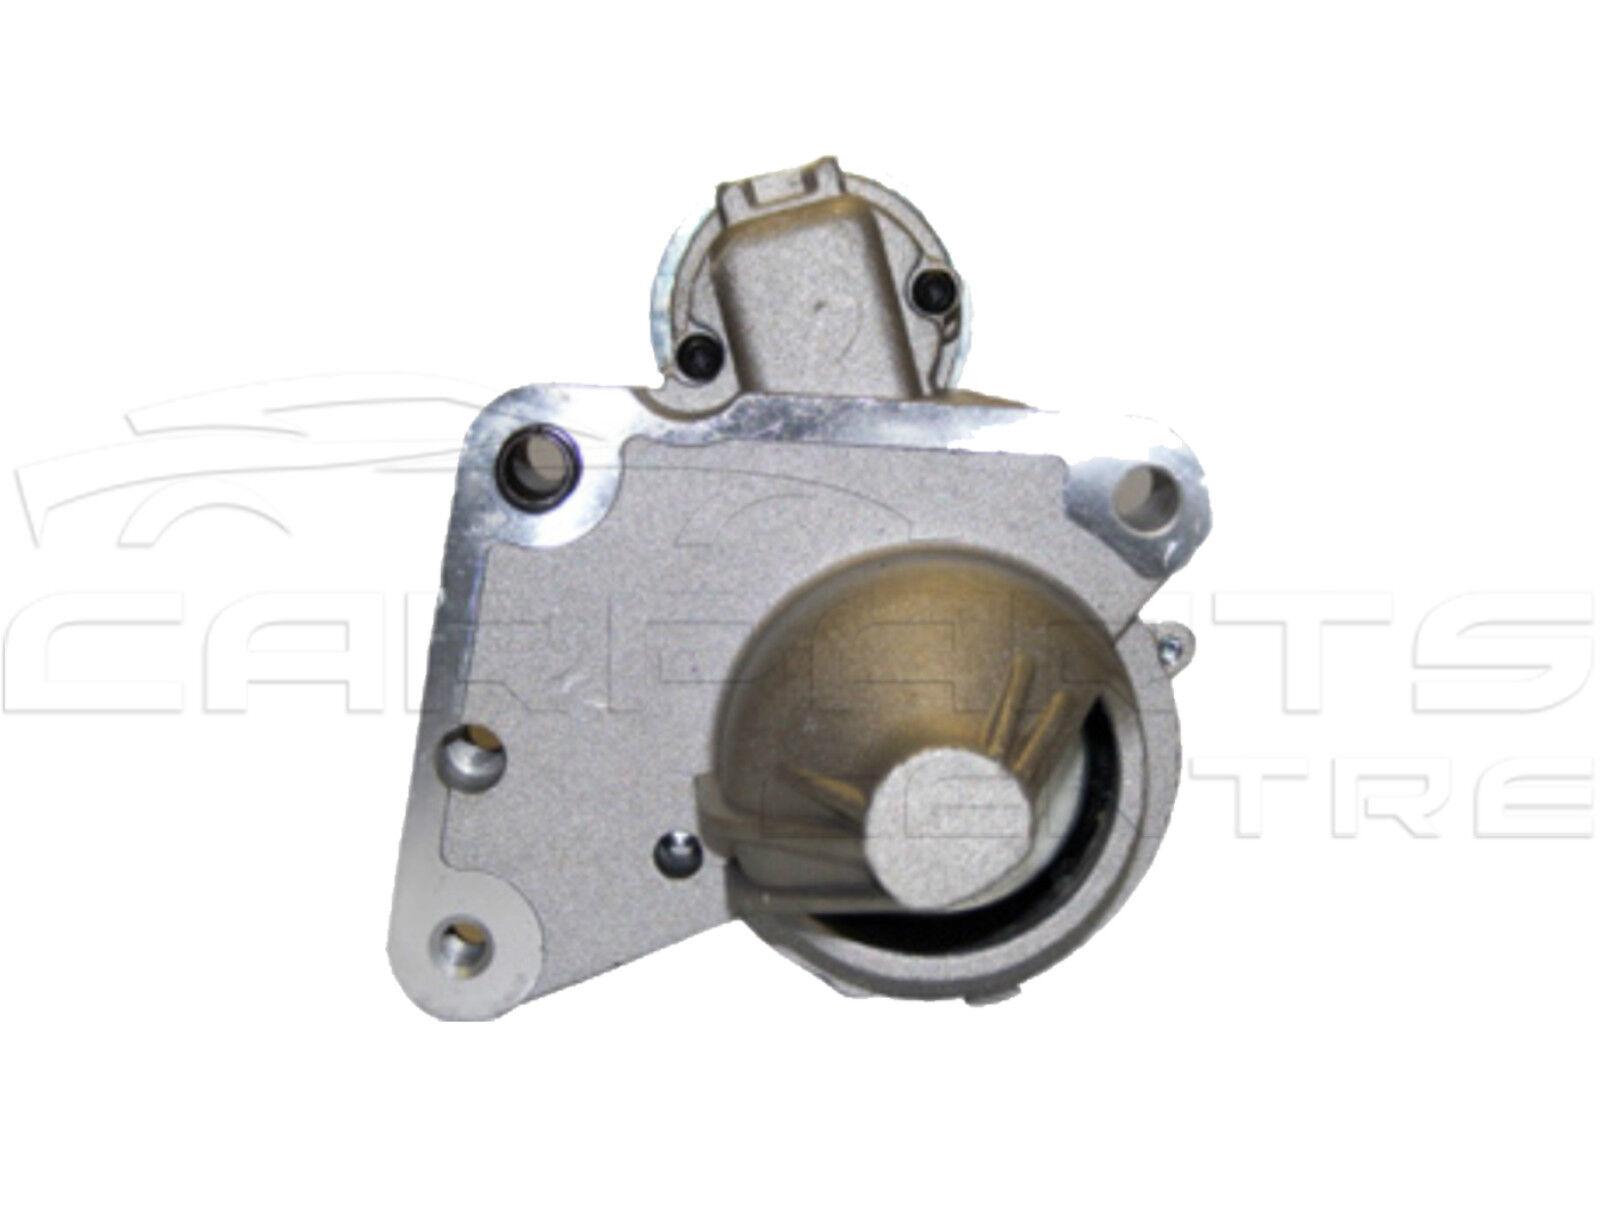 9864UK Fits CITROEN Xsara Picasso 1.6 HDi Starter Motor 2004-On